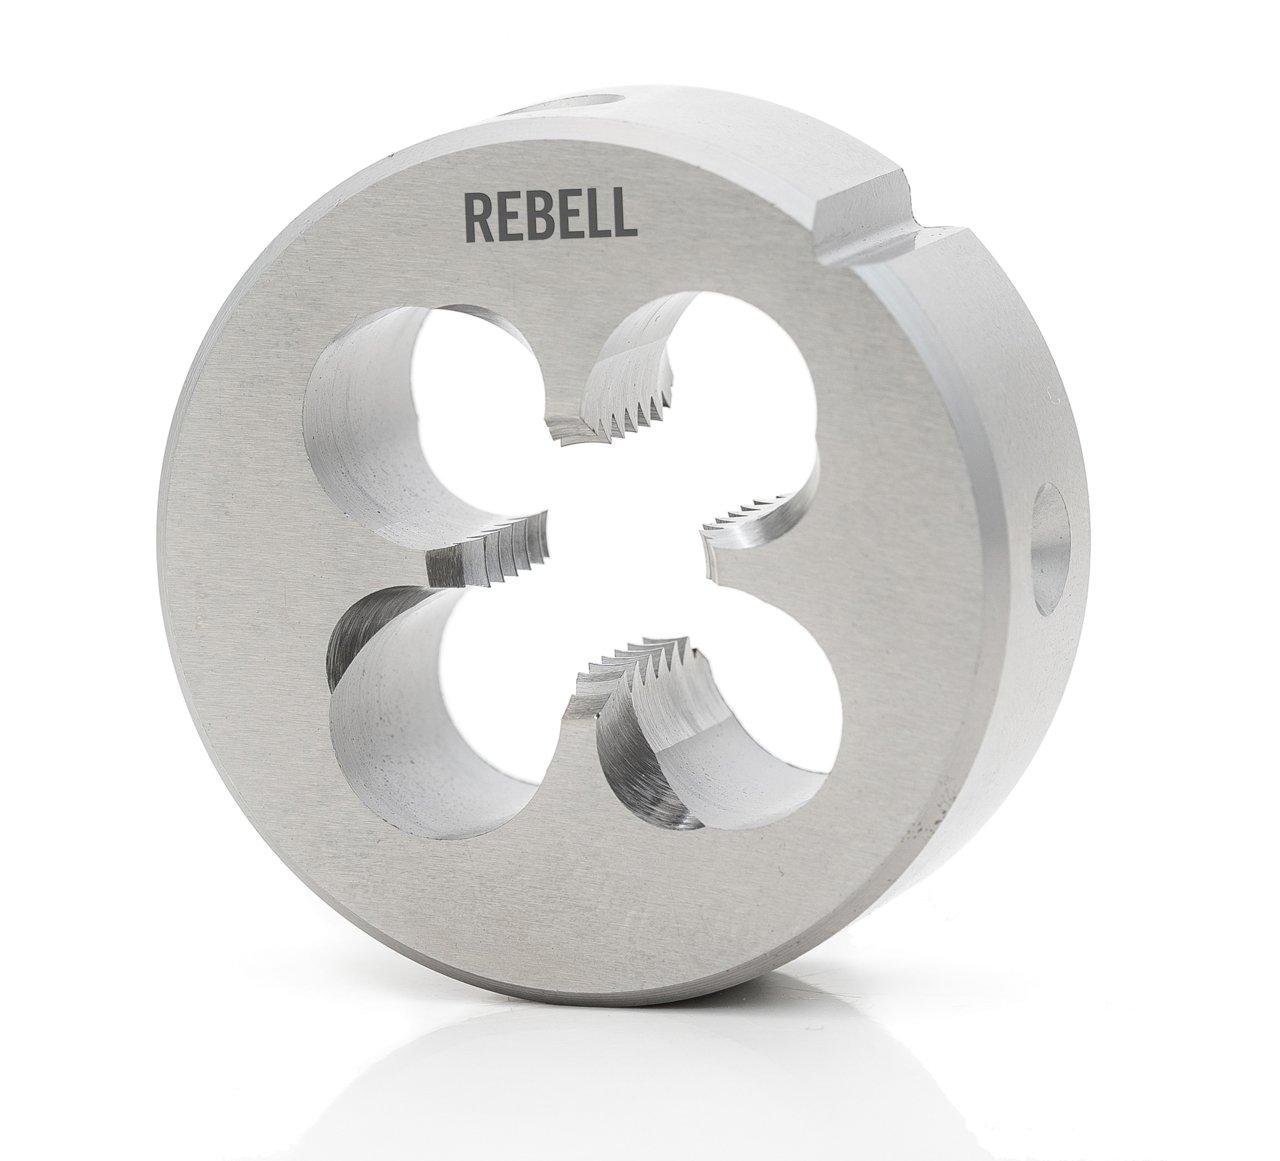 REBELL Schneideisen UNF RH 2A HSS geläppt - EN 22568 - Typ N